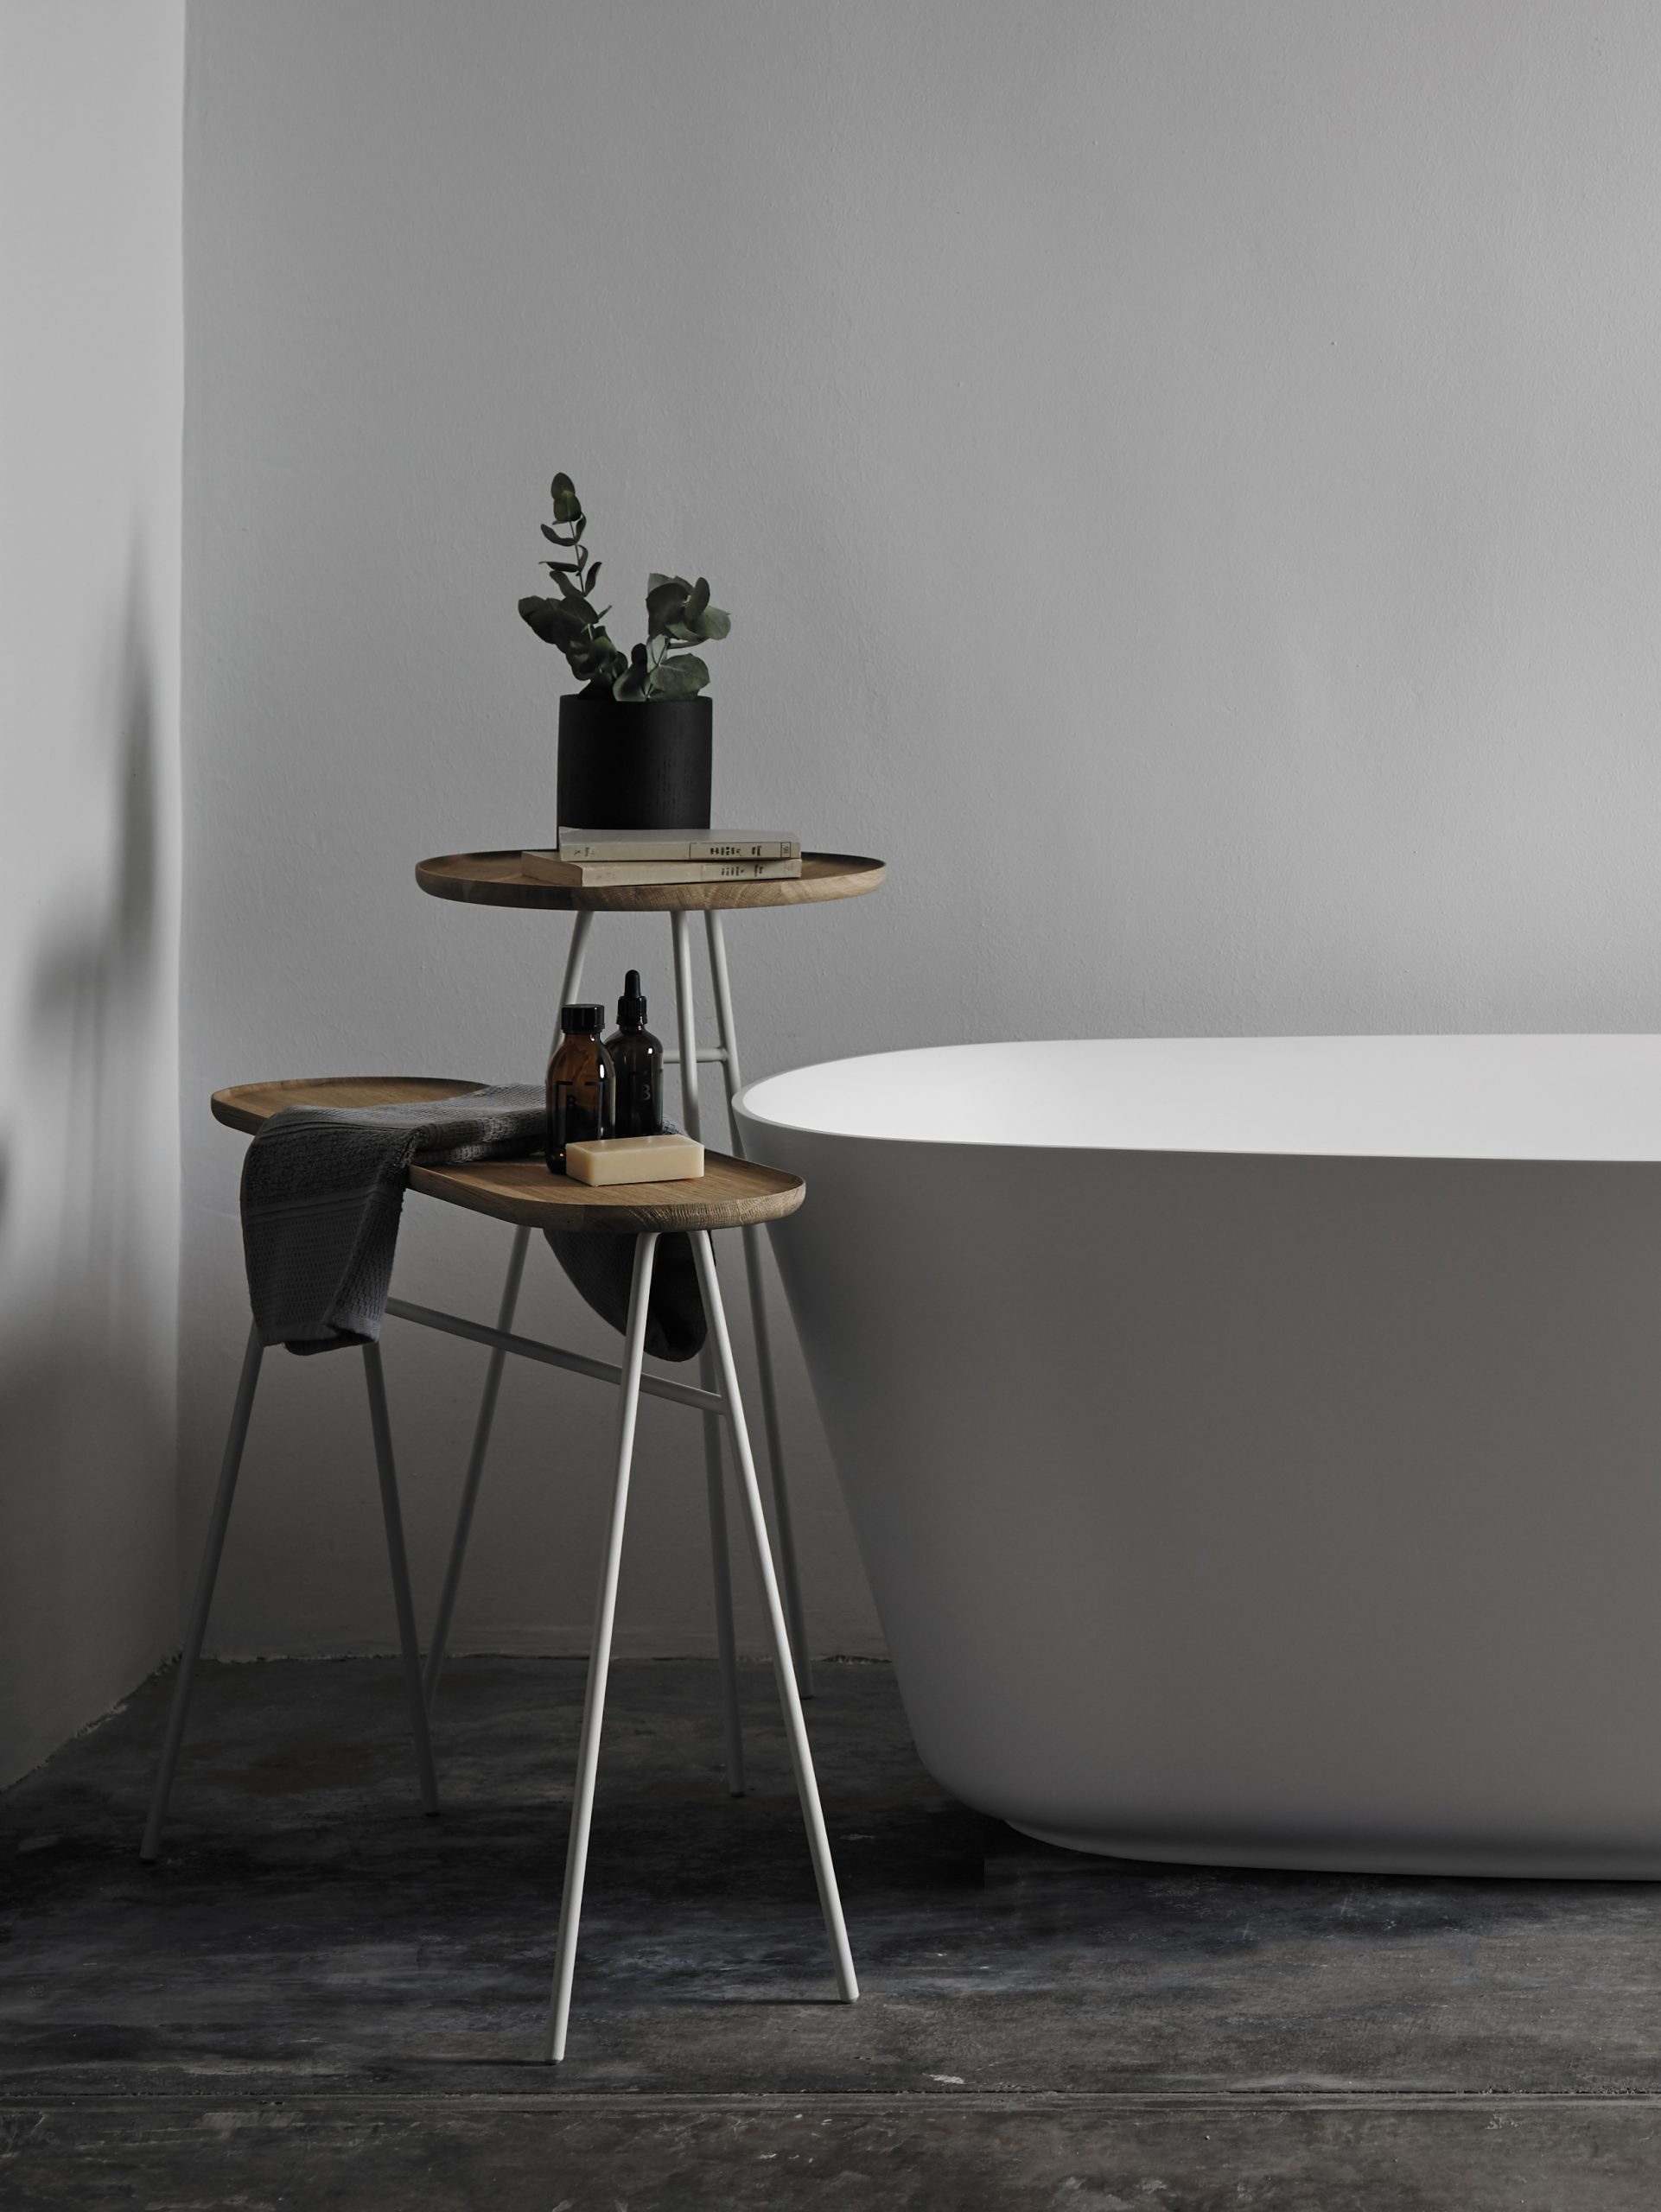 Tray designed by Debiasi Sandri for Inbani